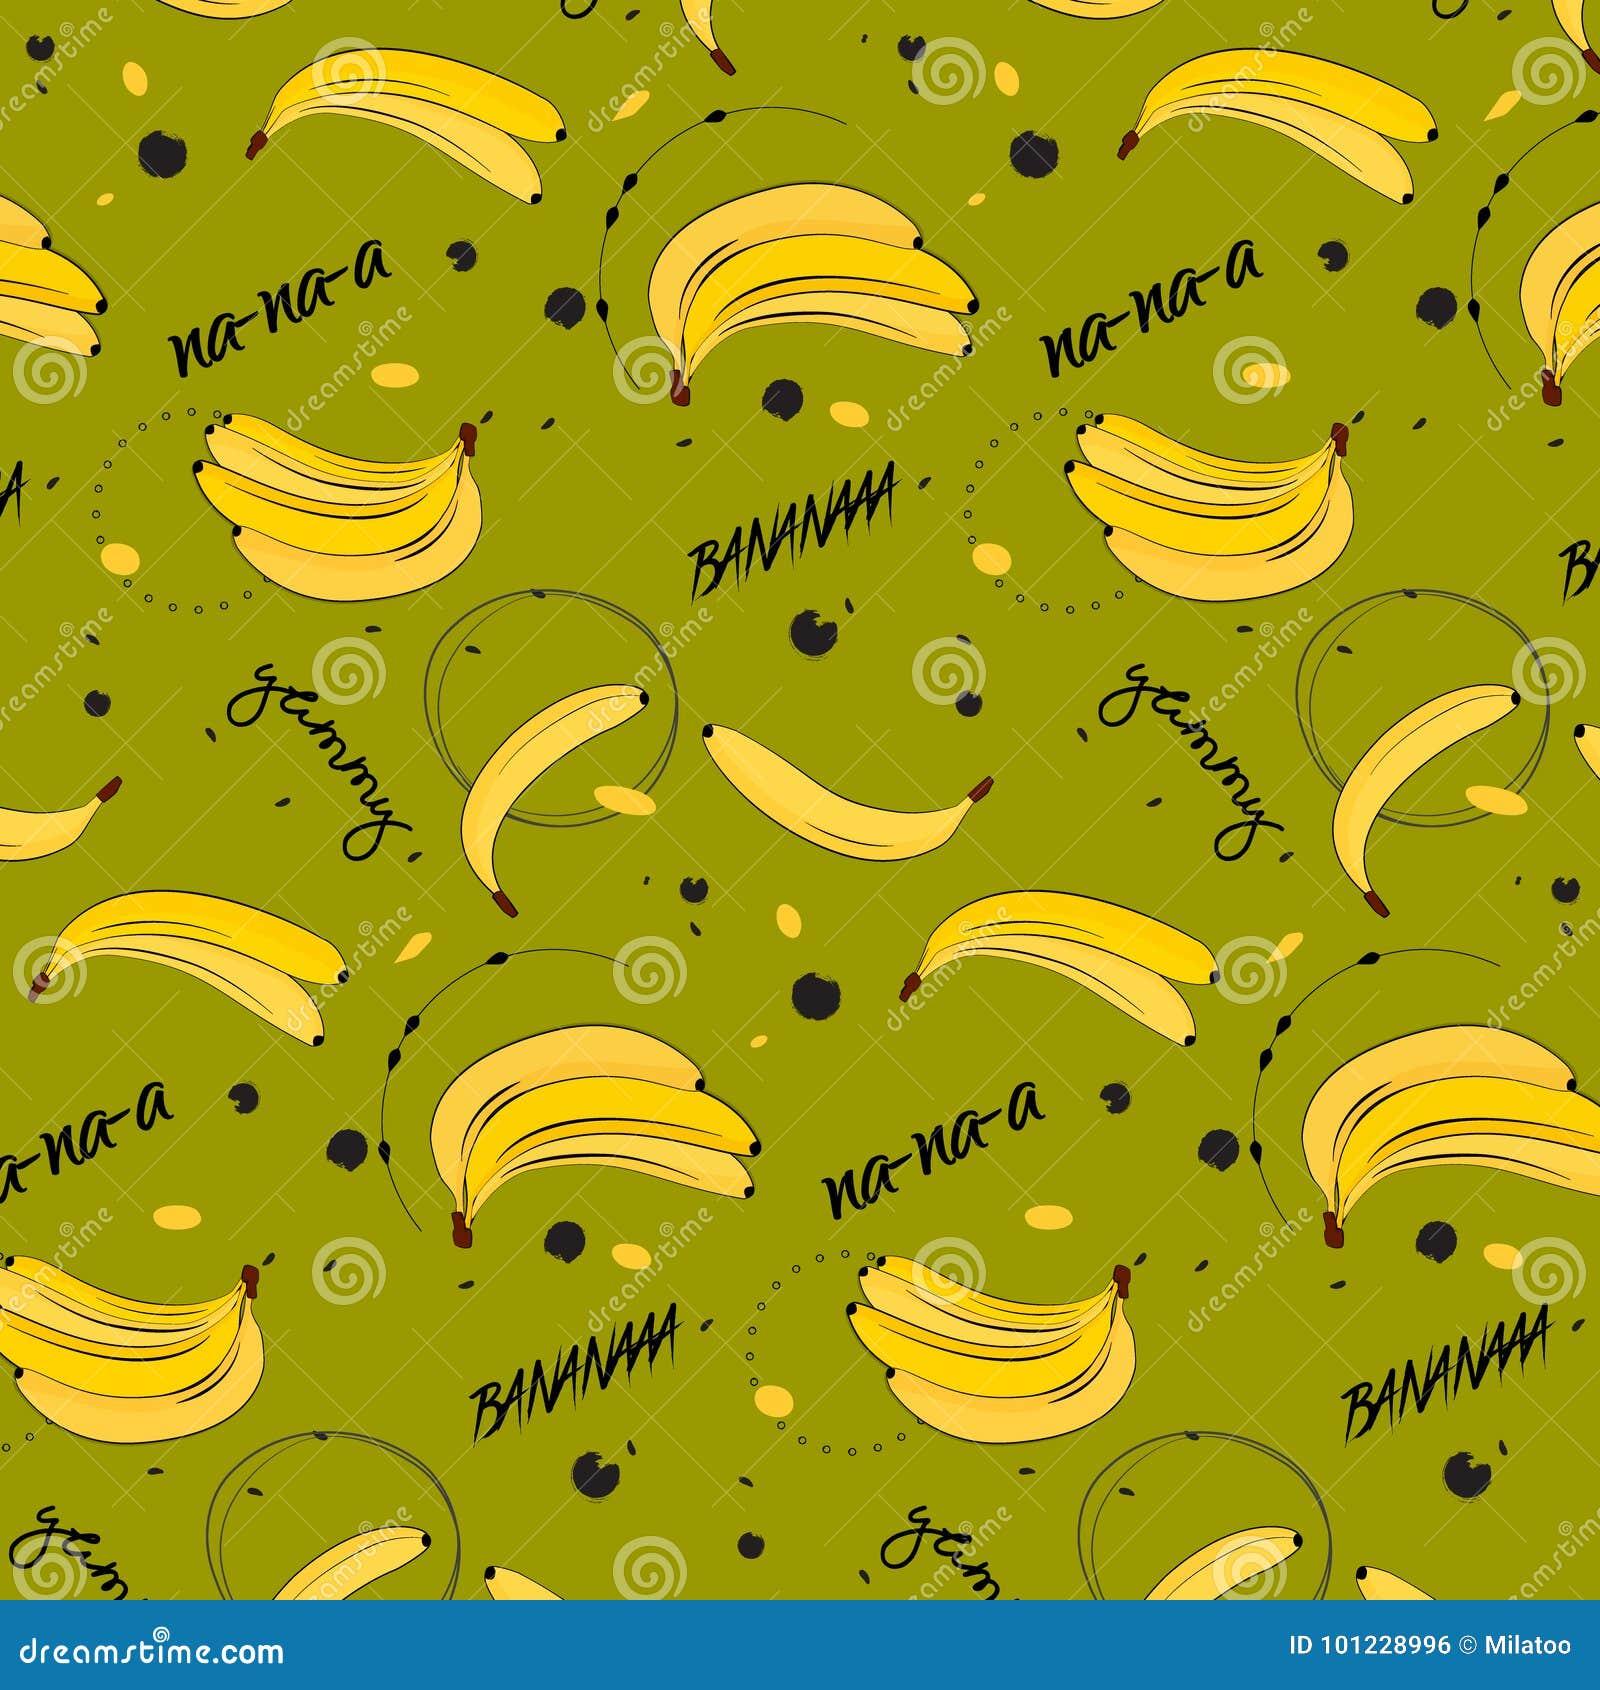 Vitamin tasty bananas pattern. Tropical food vegetarian organic background. Exotic banana drawing. Yummy beach summer